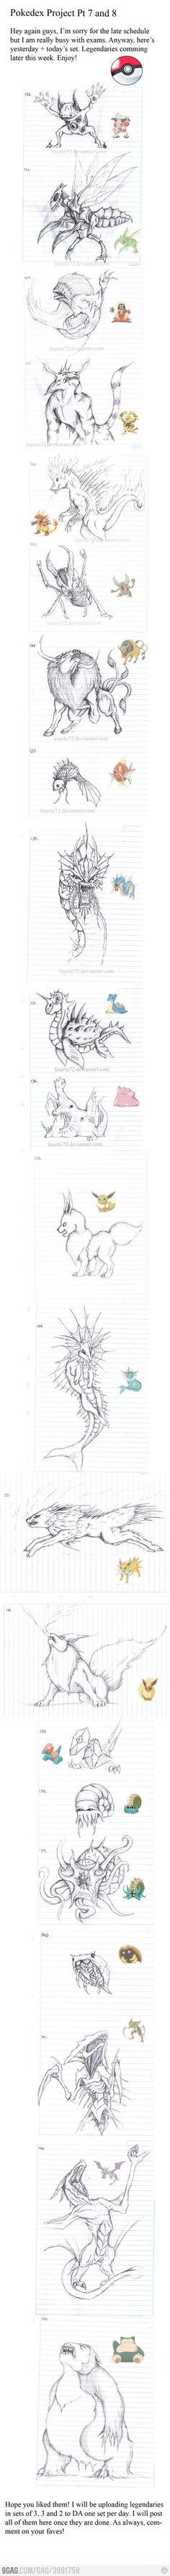 Pokemon Reimagined VII and VIII